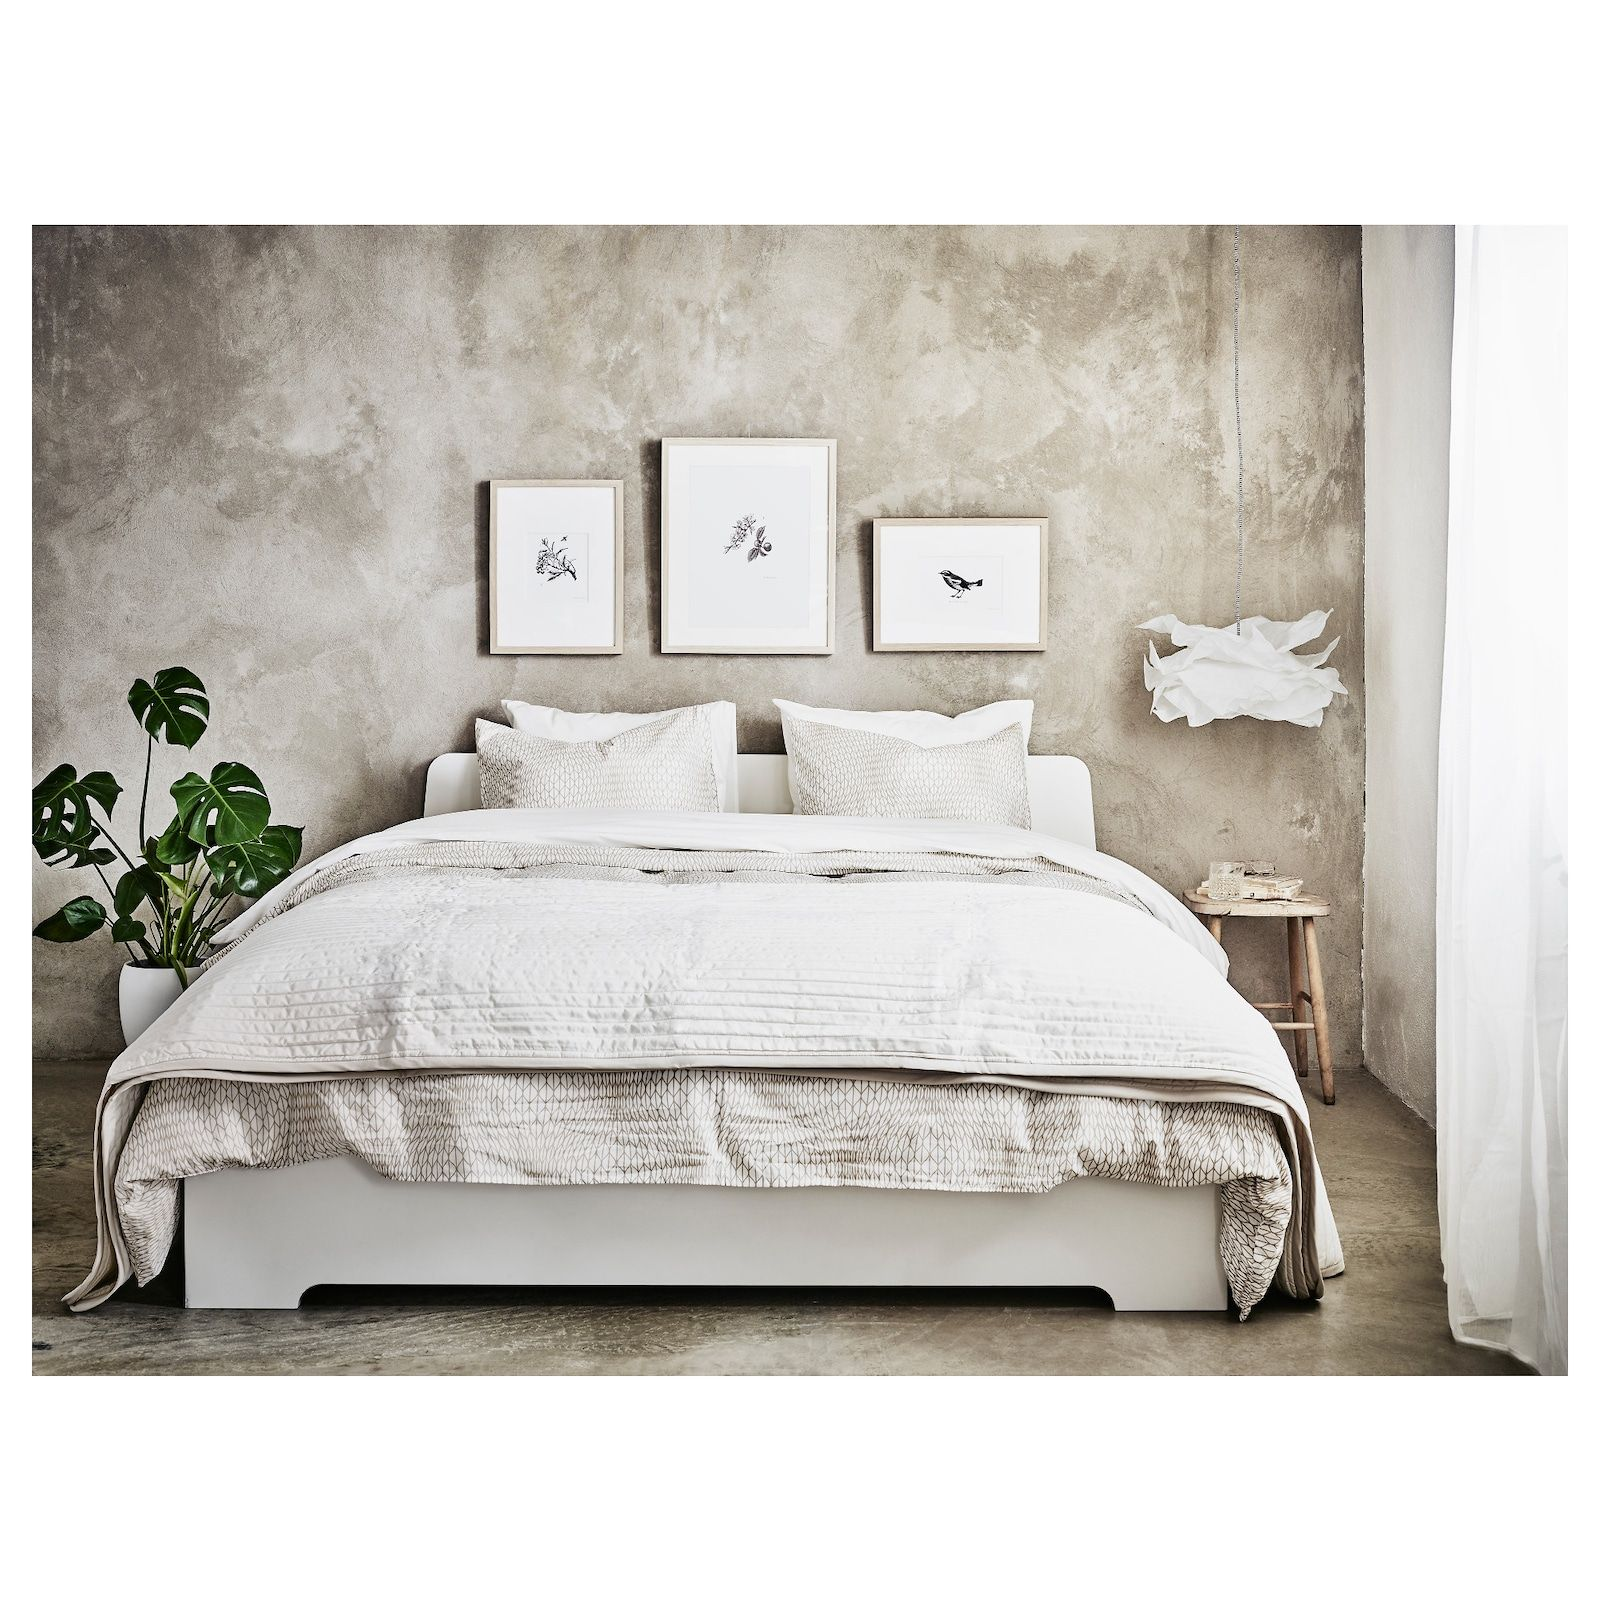 Askvoll White Luroy Bed Frame Standard Double Ikea In 2020 Bed Frame Askvoll Adjustable Beds